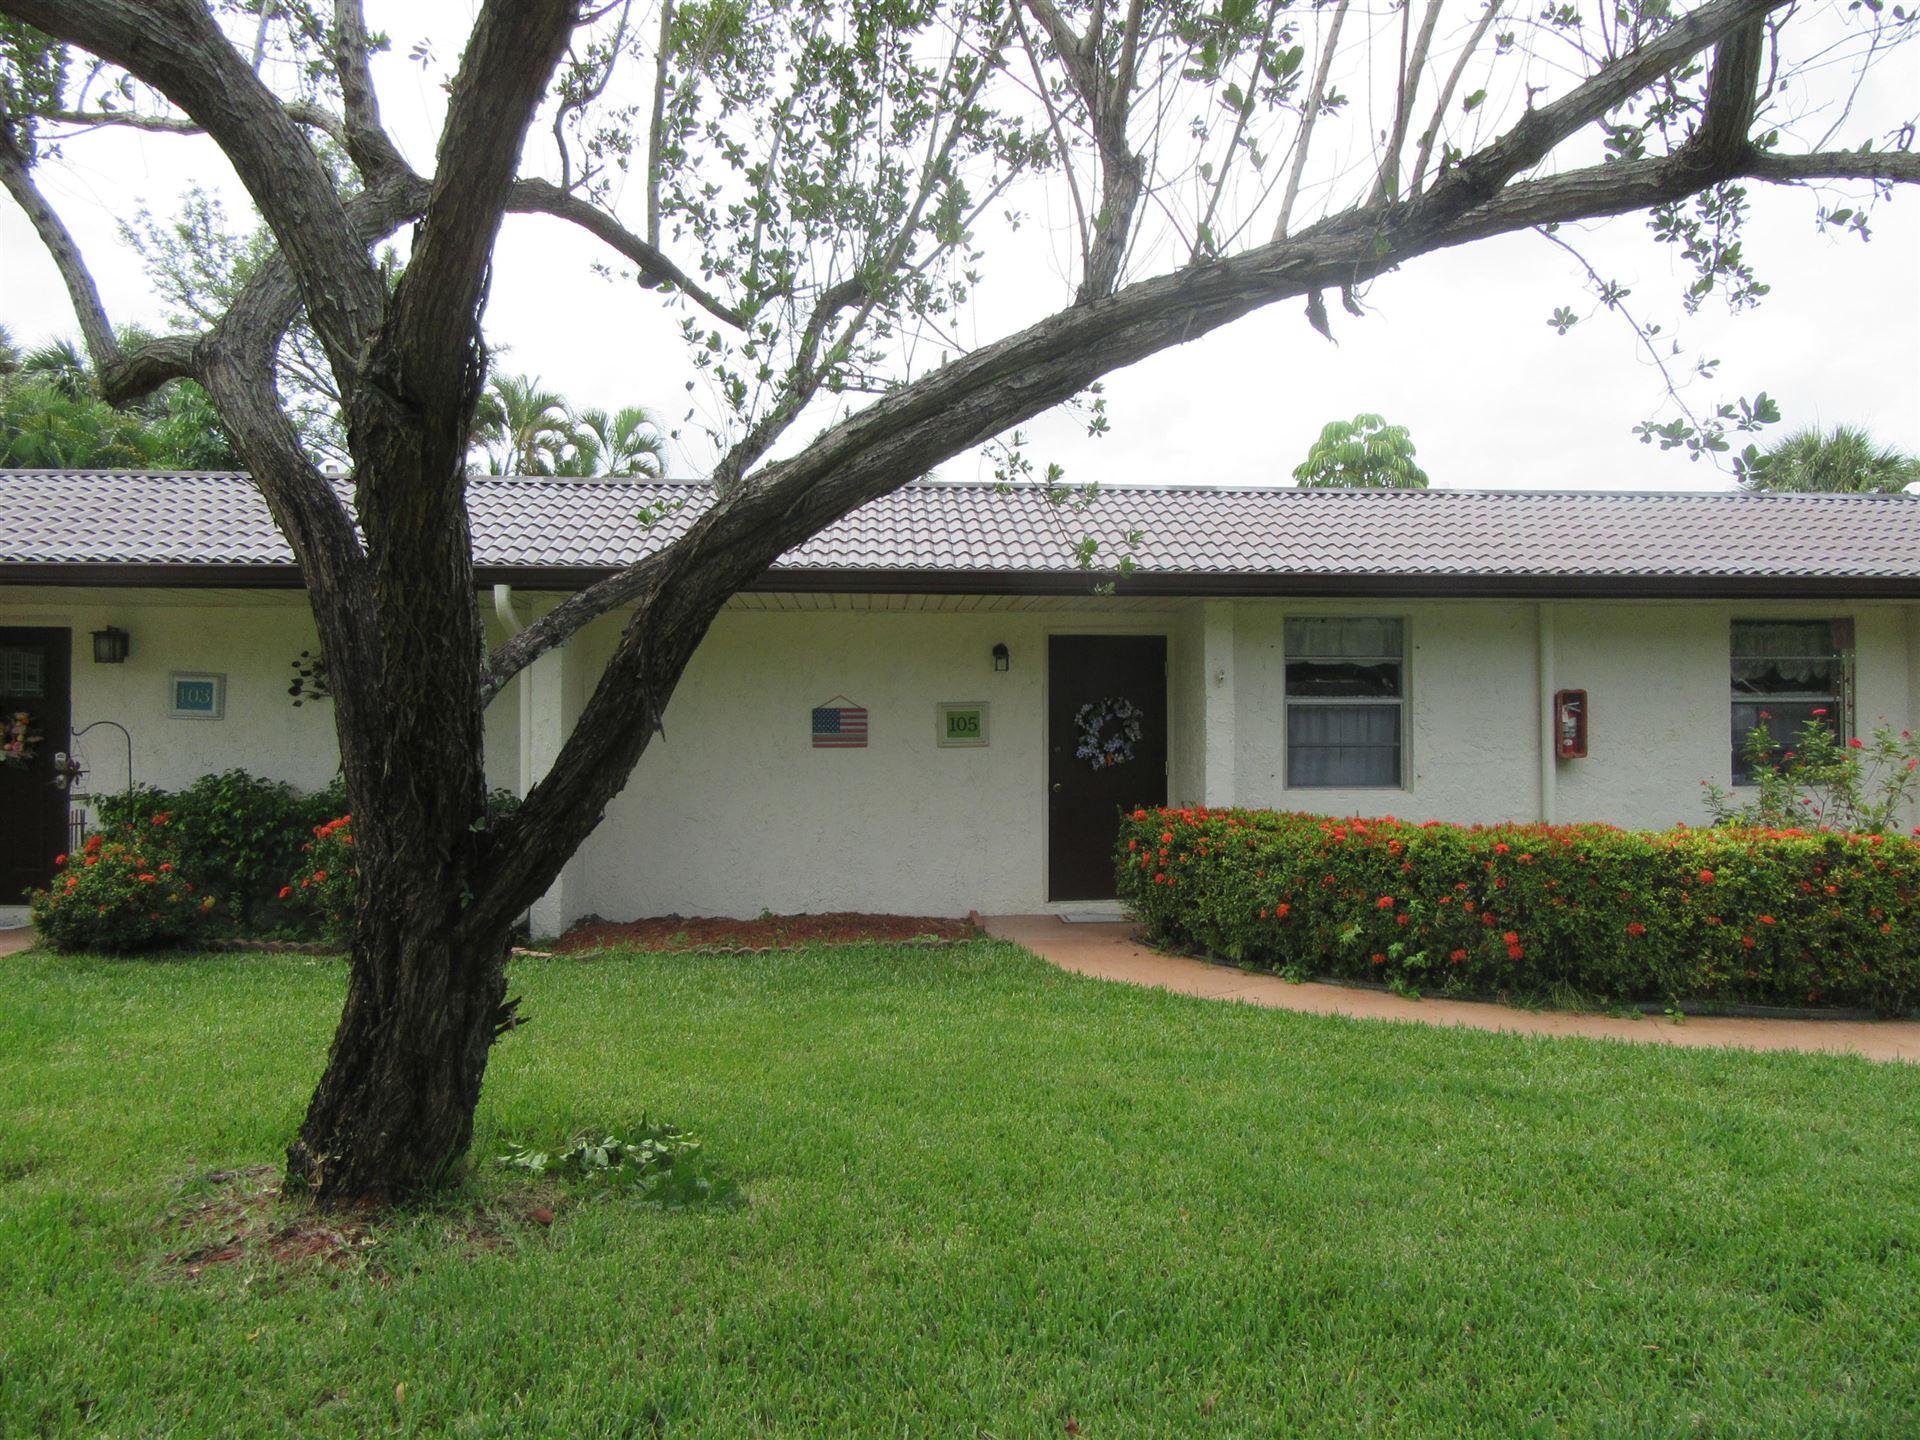 Photo of 105 Lake Olive Drive, West Palm Beach, FL 33411 (MLS # RX-10725719)